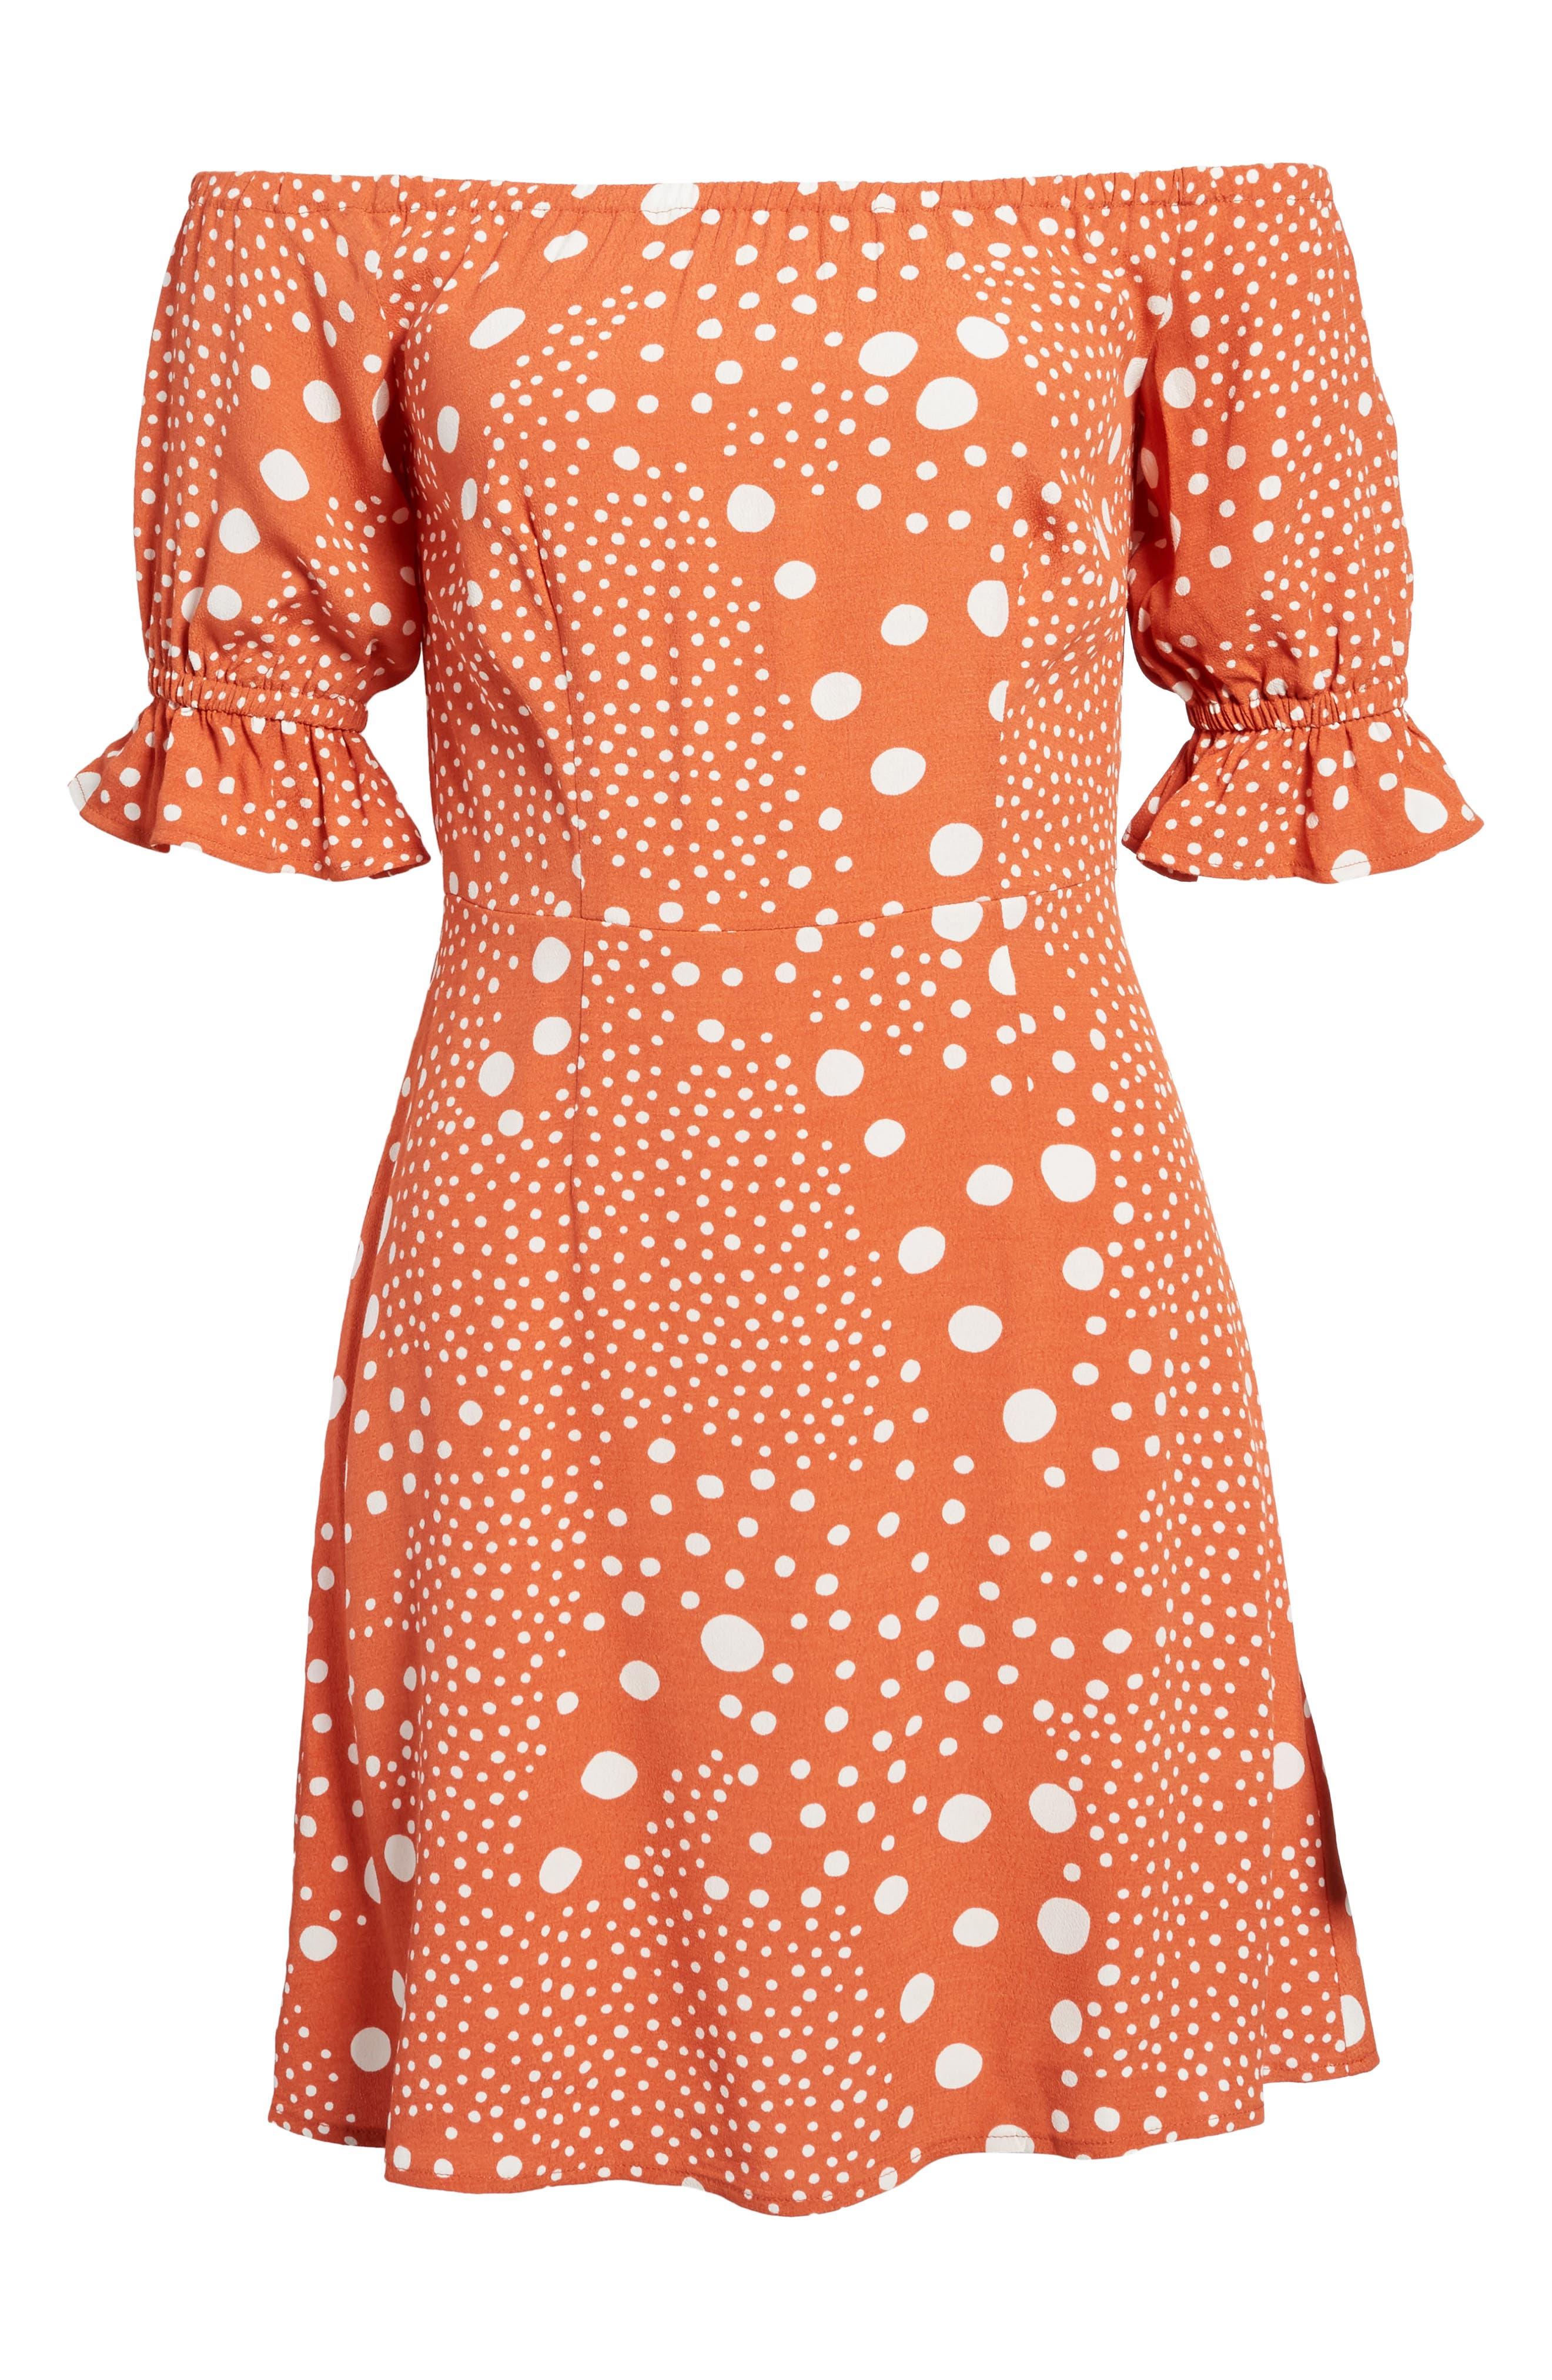 Peppers Polka Dot Off the Shoulder Dress,                             Alternate thumbnail 7, color,                             Rust Pebble